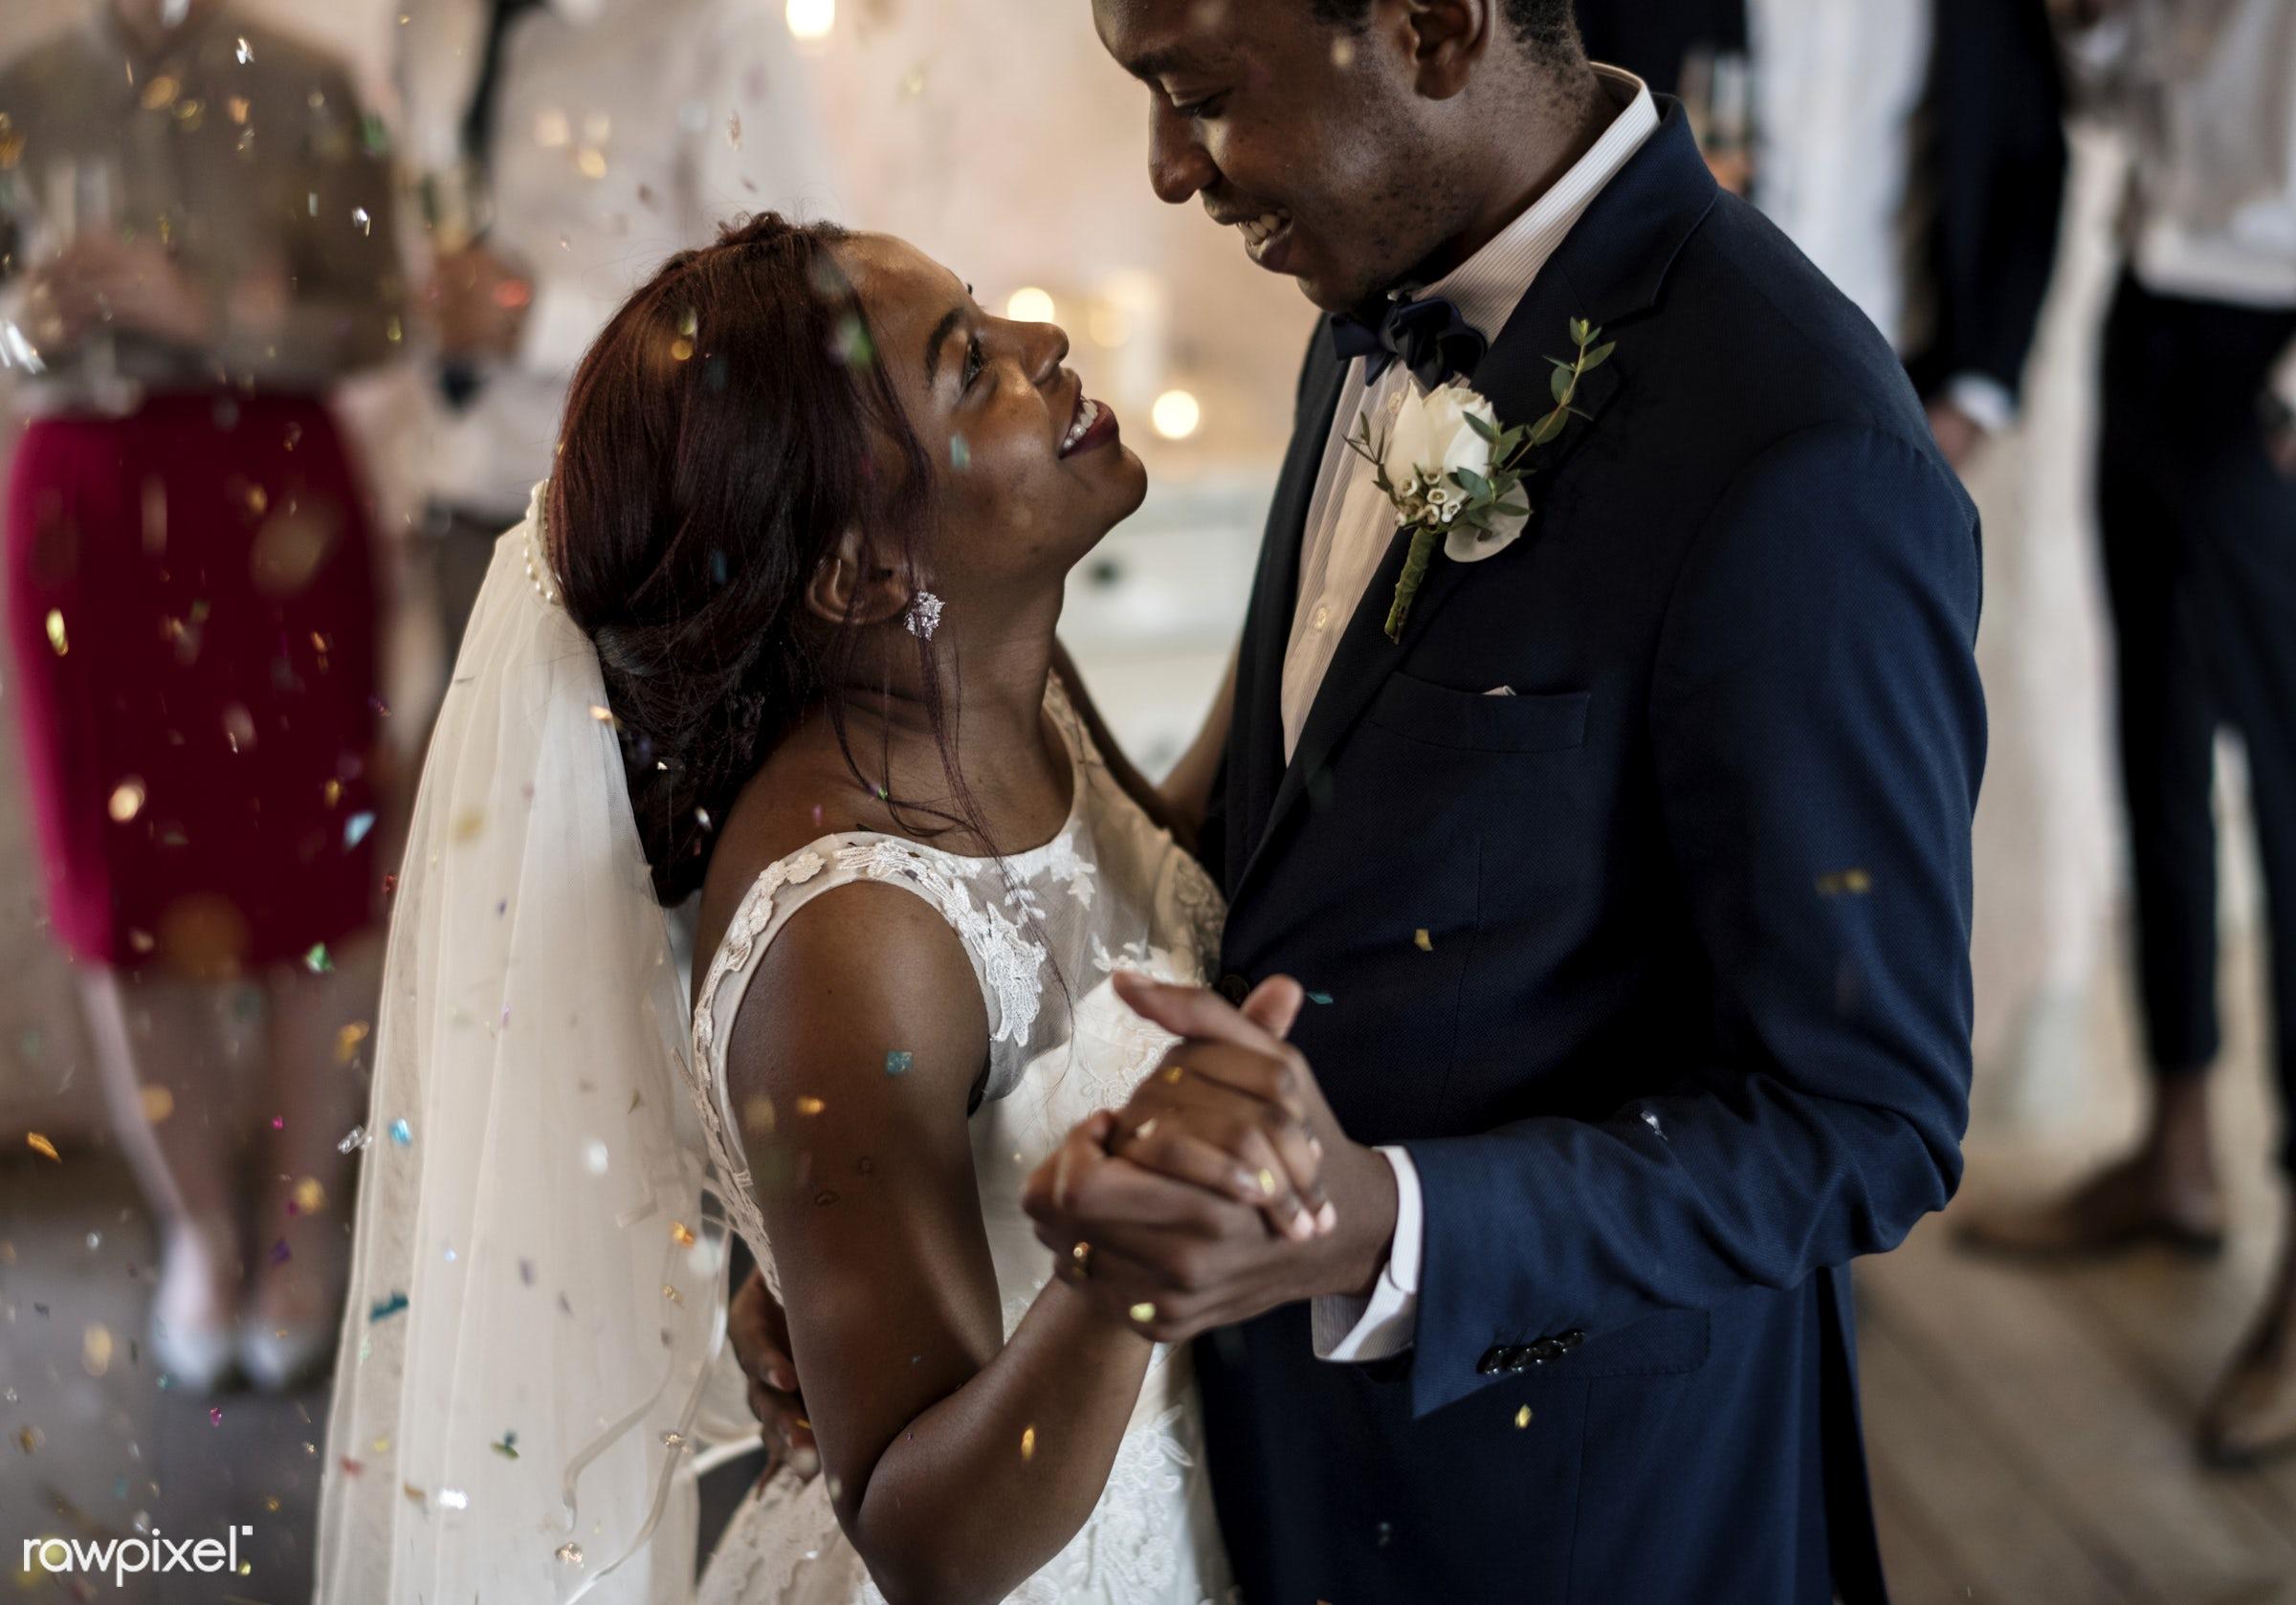 Bridge and groom wedding day - wedding, bride, african descent, affection, black, celebration, cheerful, confetti, couple,...